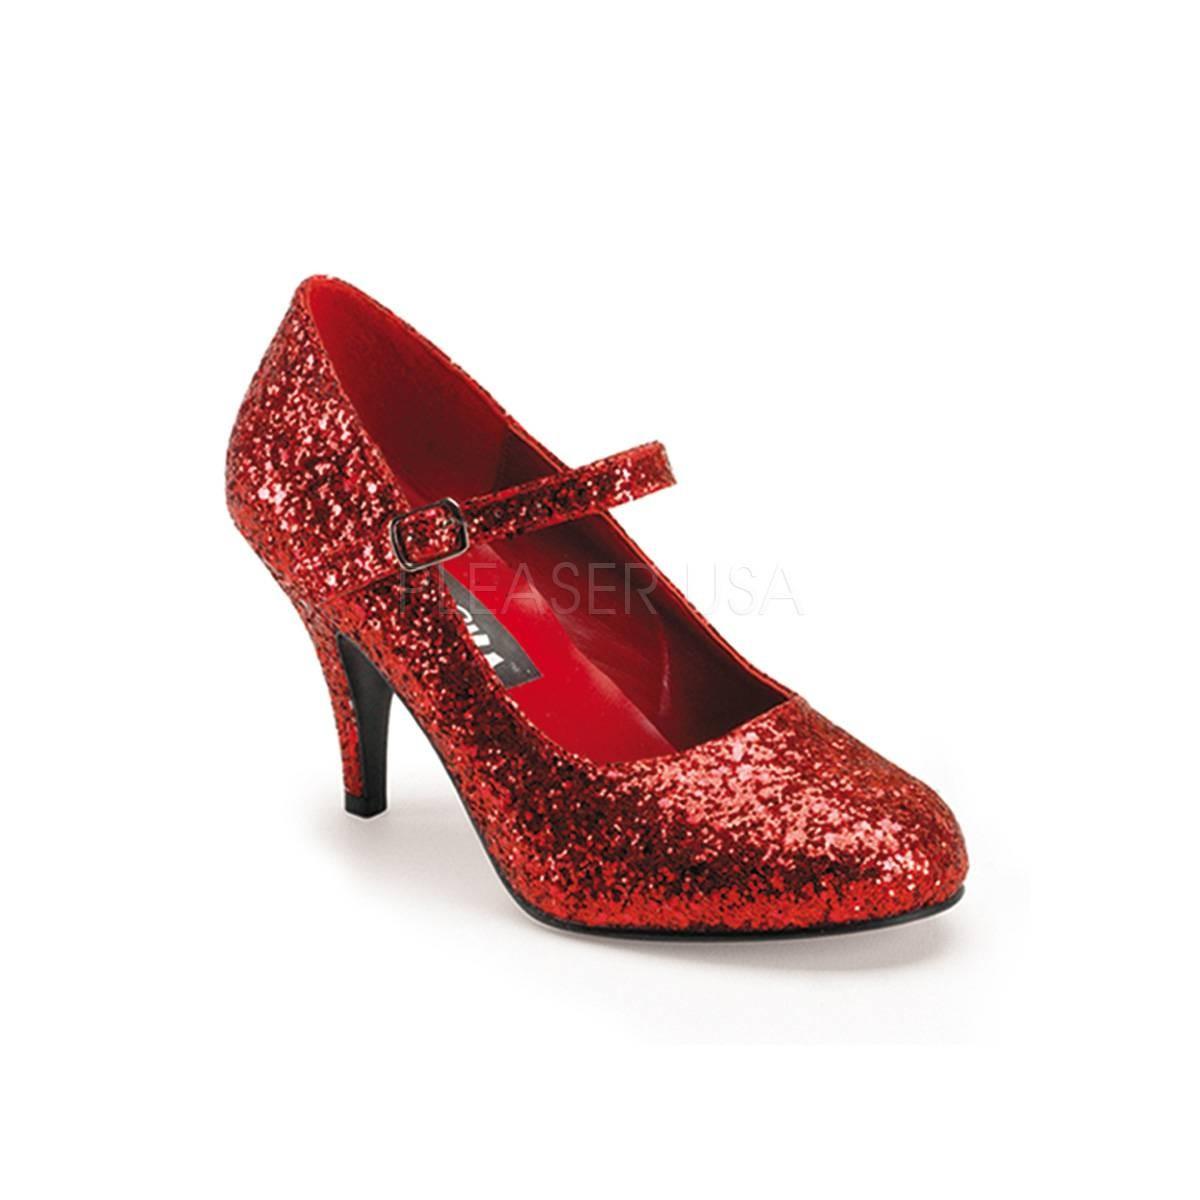 Pumps - GLINDA 50G ° Damen Pumps ° Rot Glitter ° Funtasma  - Onlineshop RedSixty